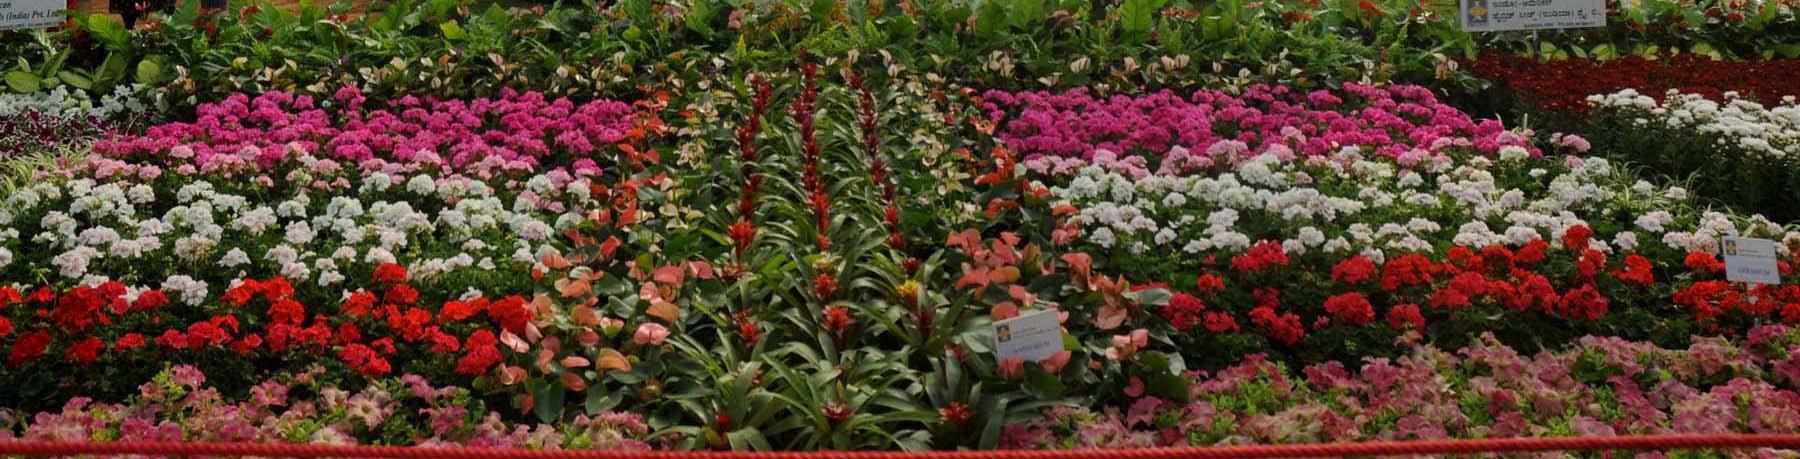 Lal Bagh, Bengaluru -  Lal Bagh Botanical Gardens